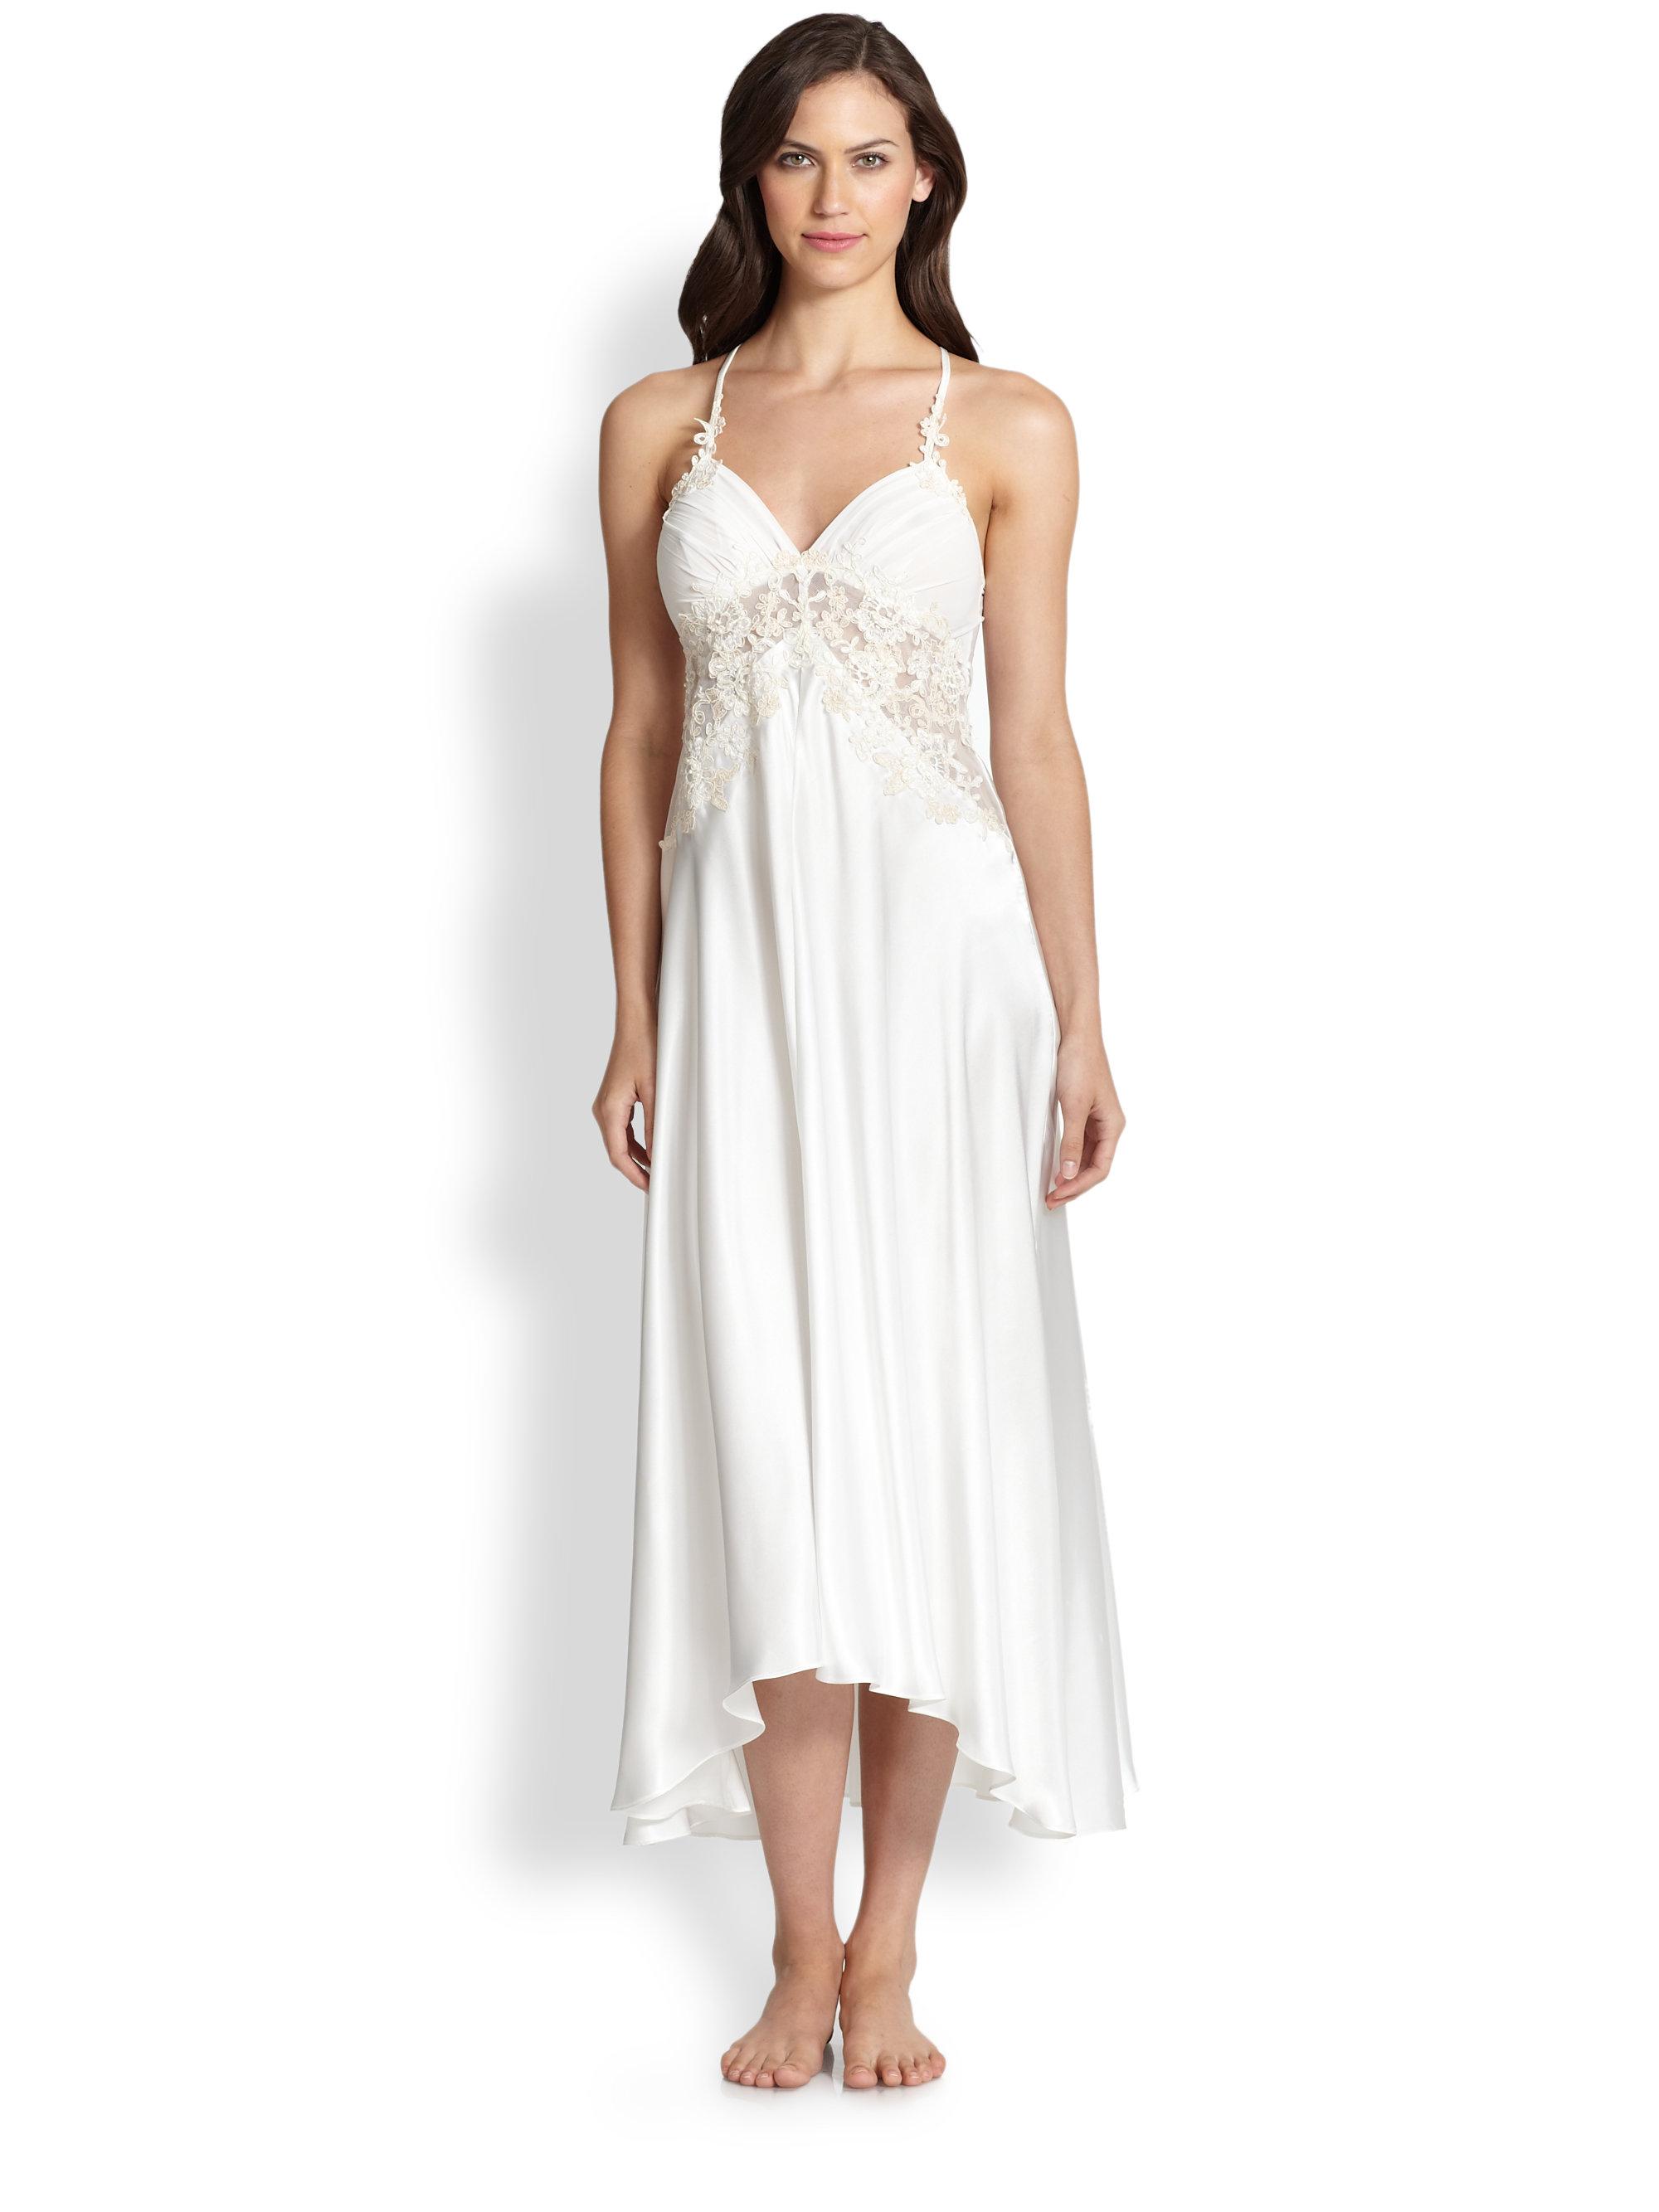 Lyst - Jonquil Sabrina Satin Sleep Gown in Natural